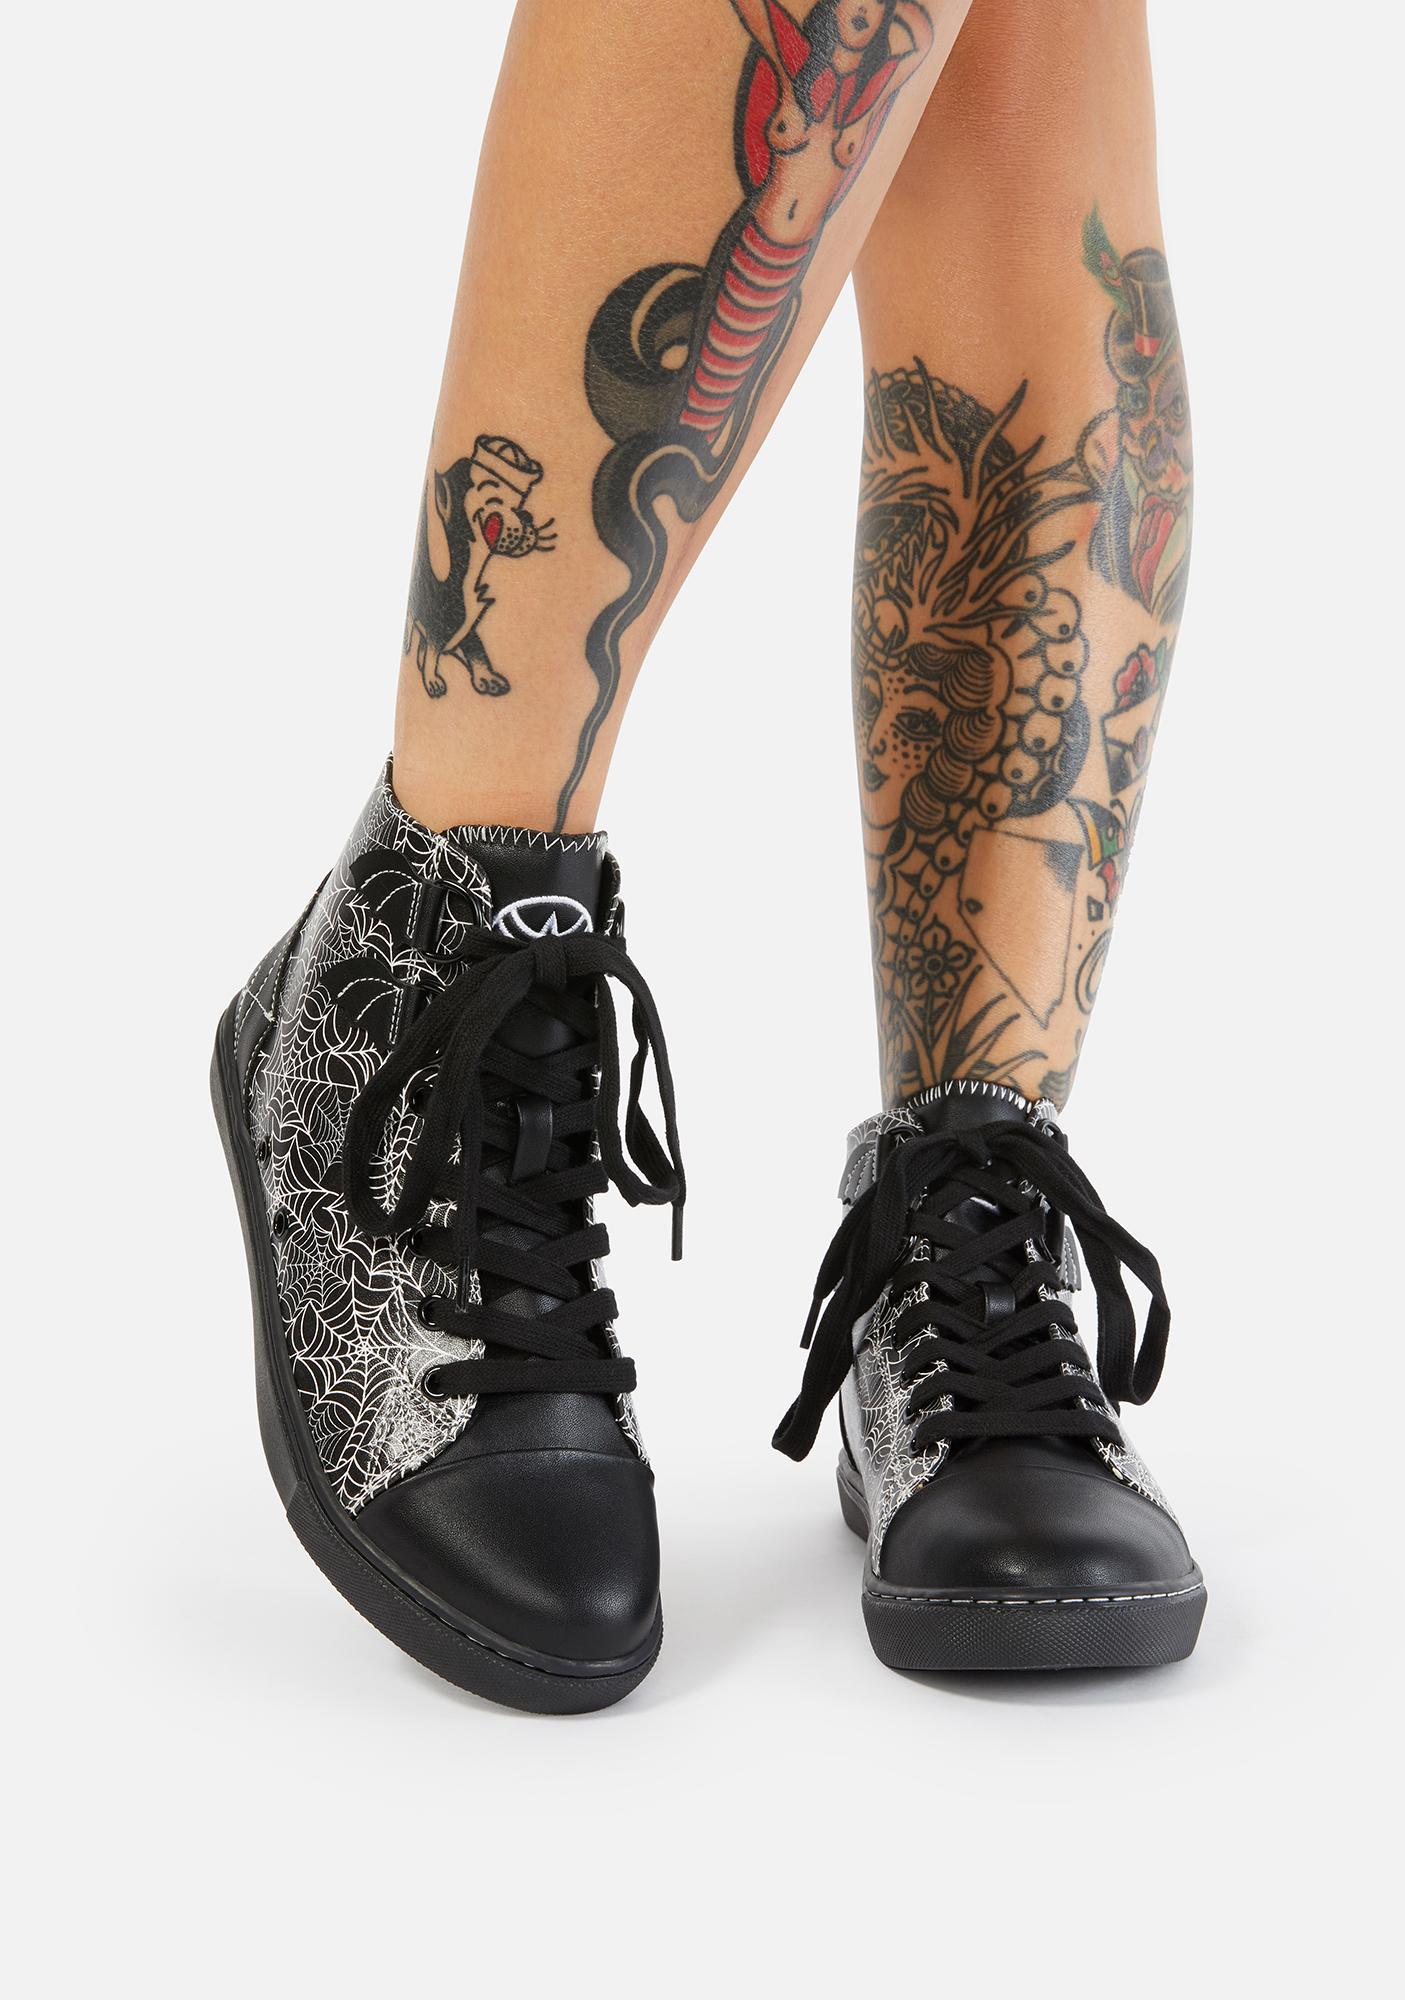 Strange Cvlt Spider Web Chelsea Ankle Boots